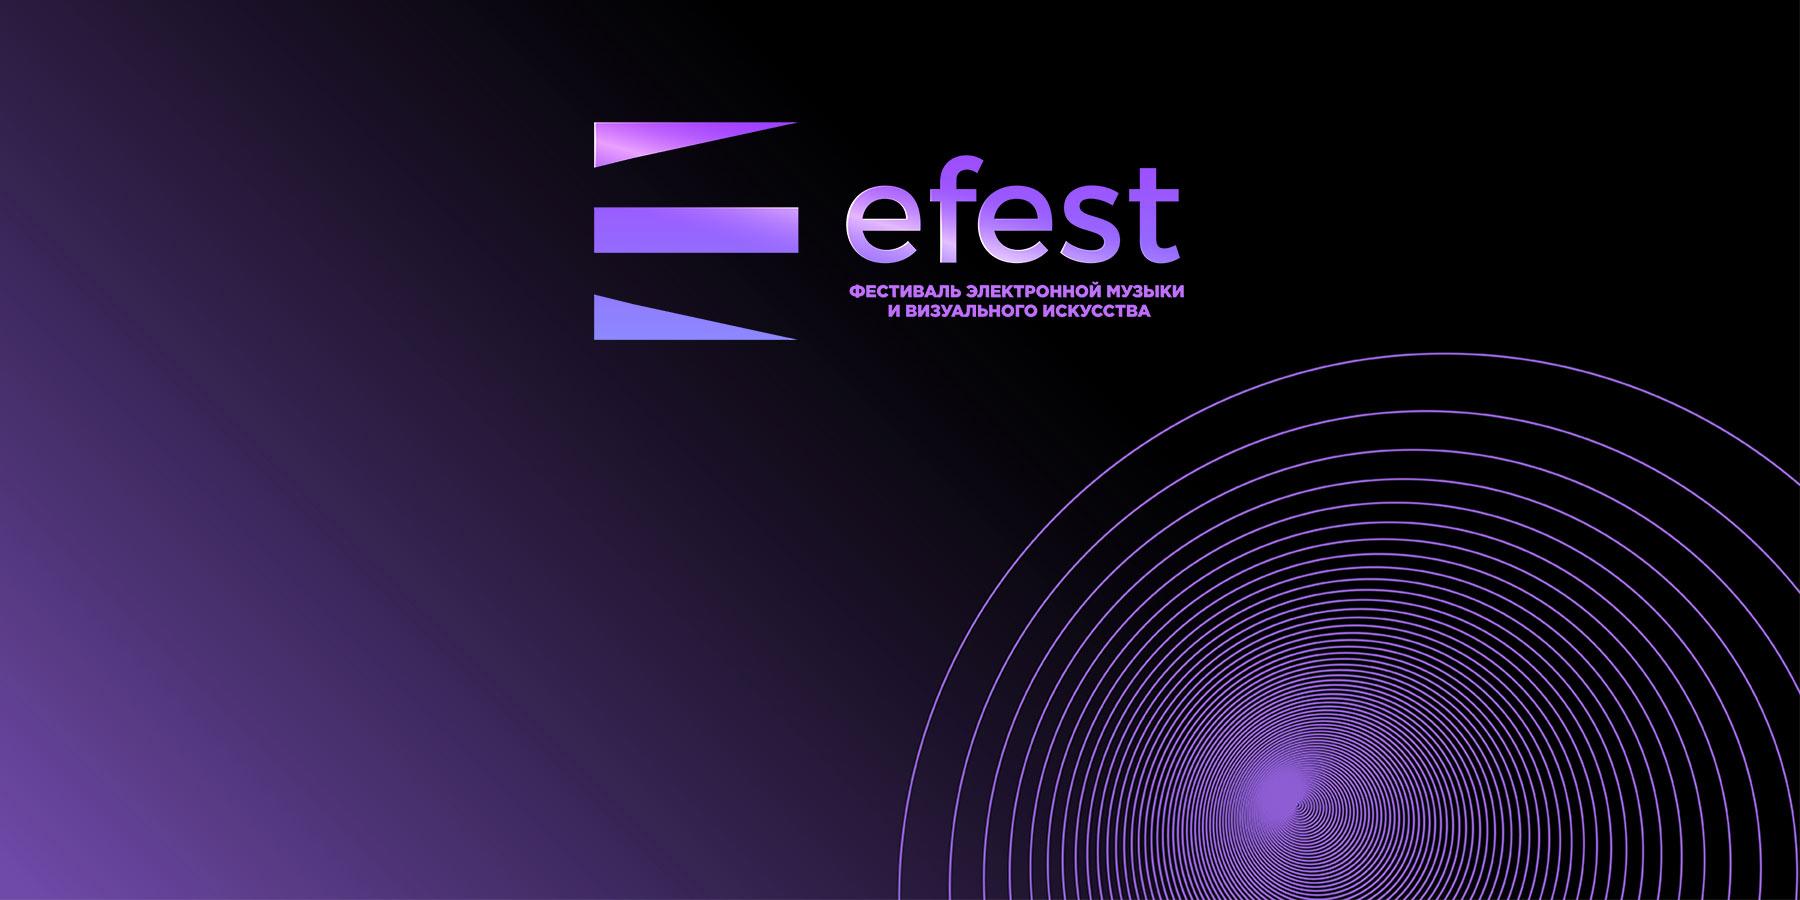 EFEST 2021